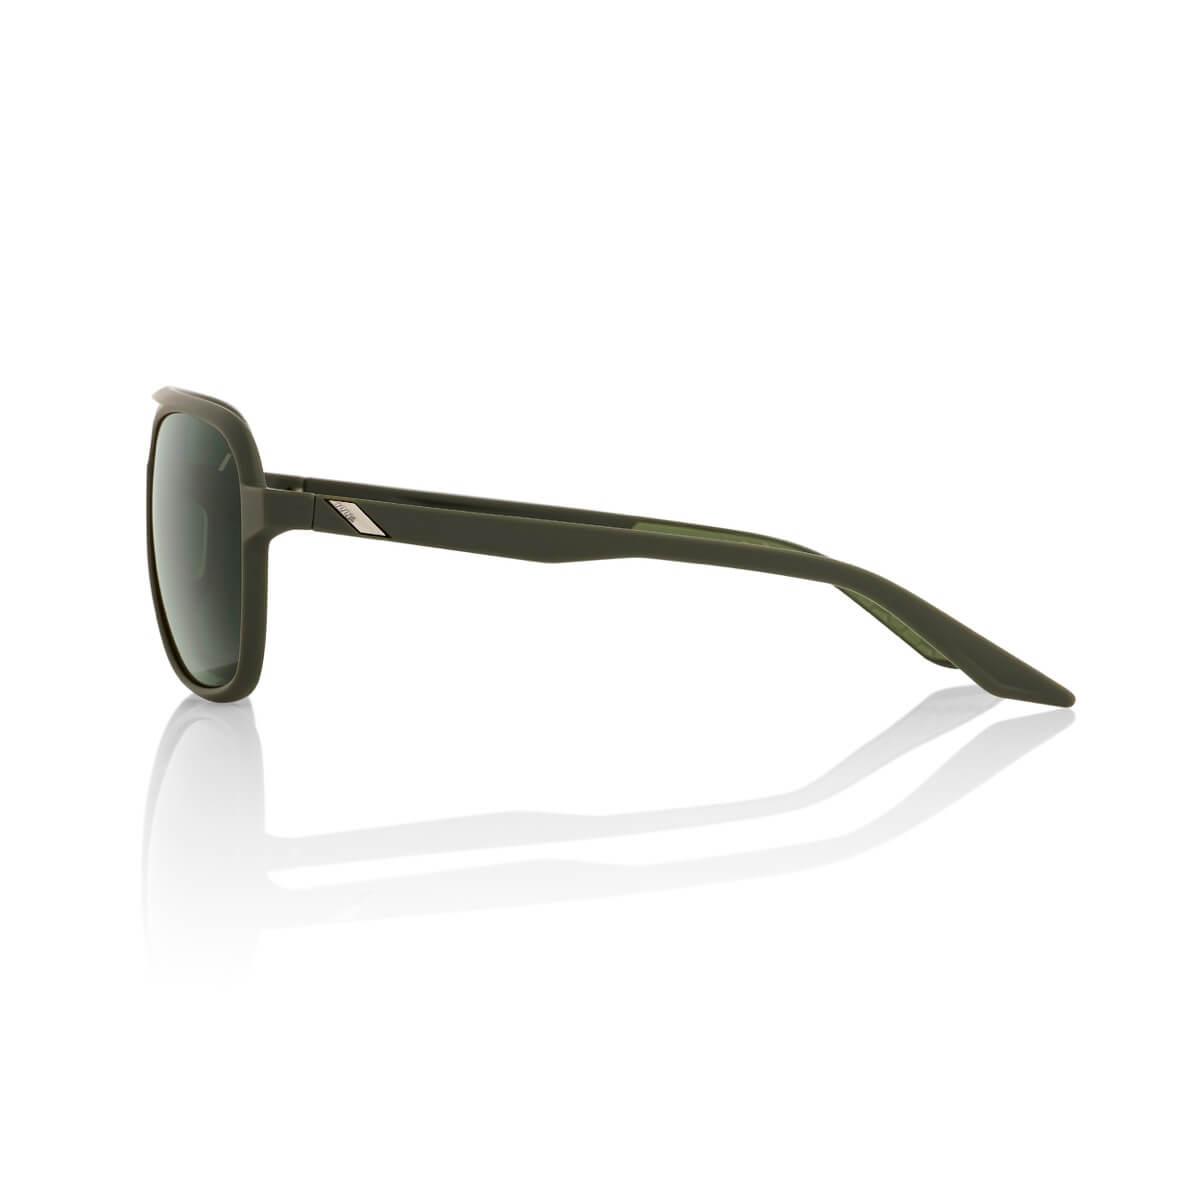 KASIA Aviator Round – Soft Tact Army Green – Grey Green Lens